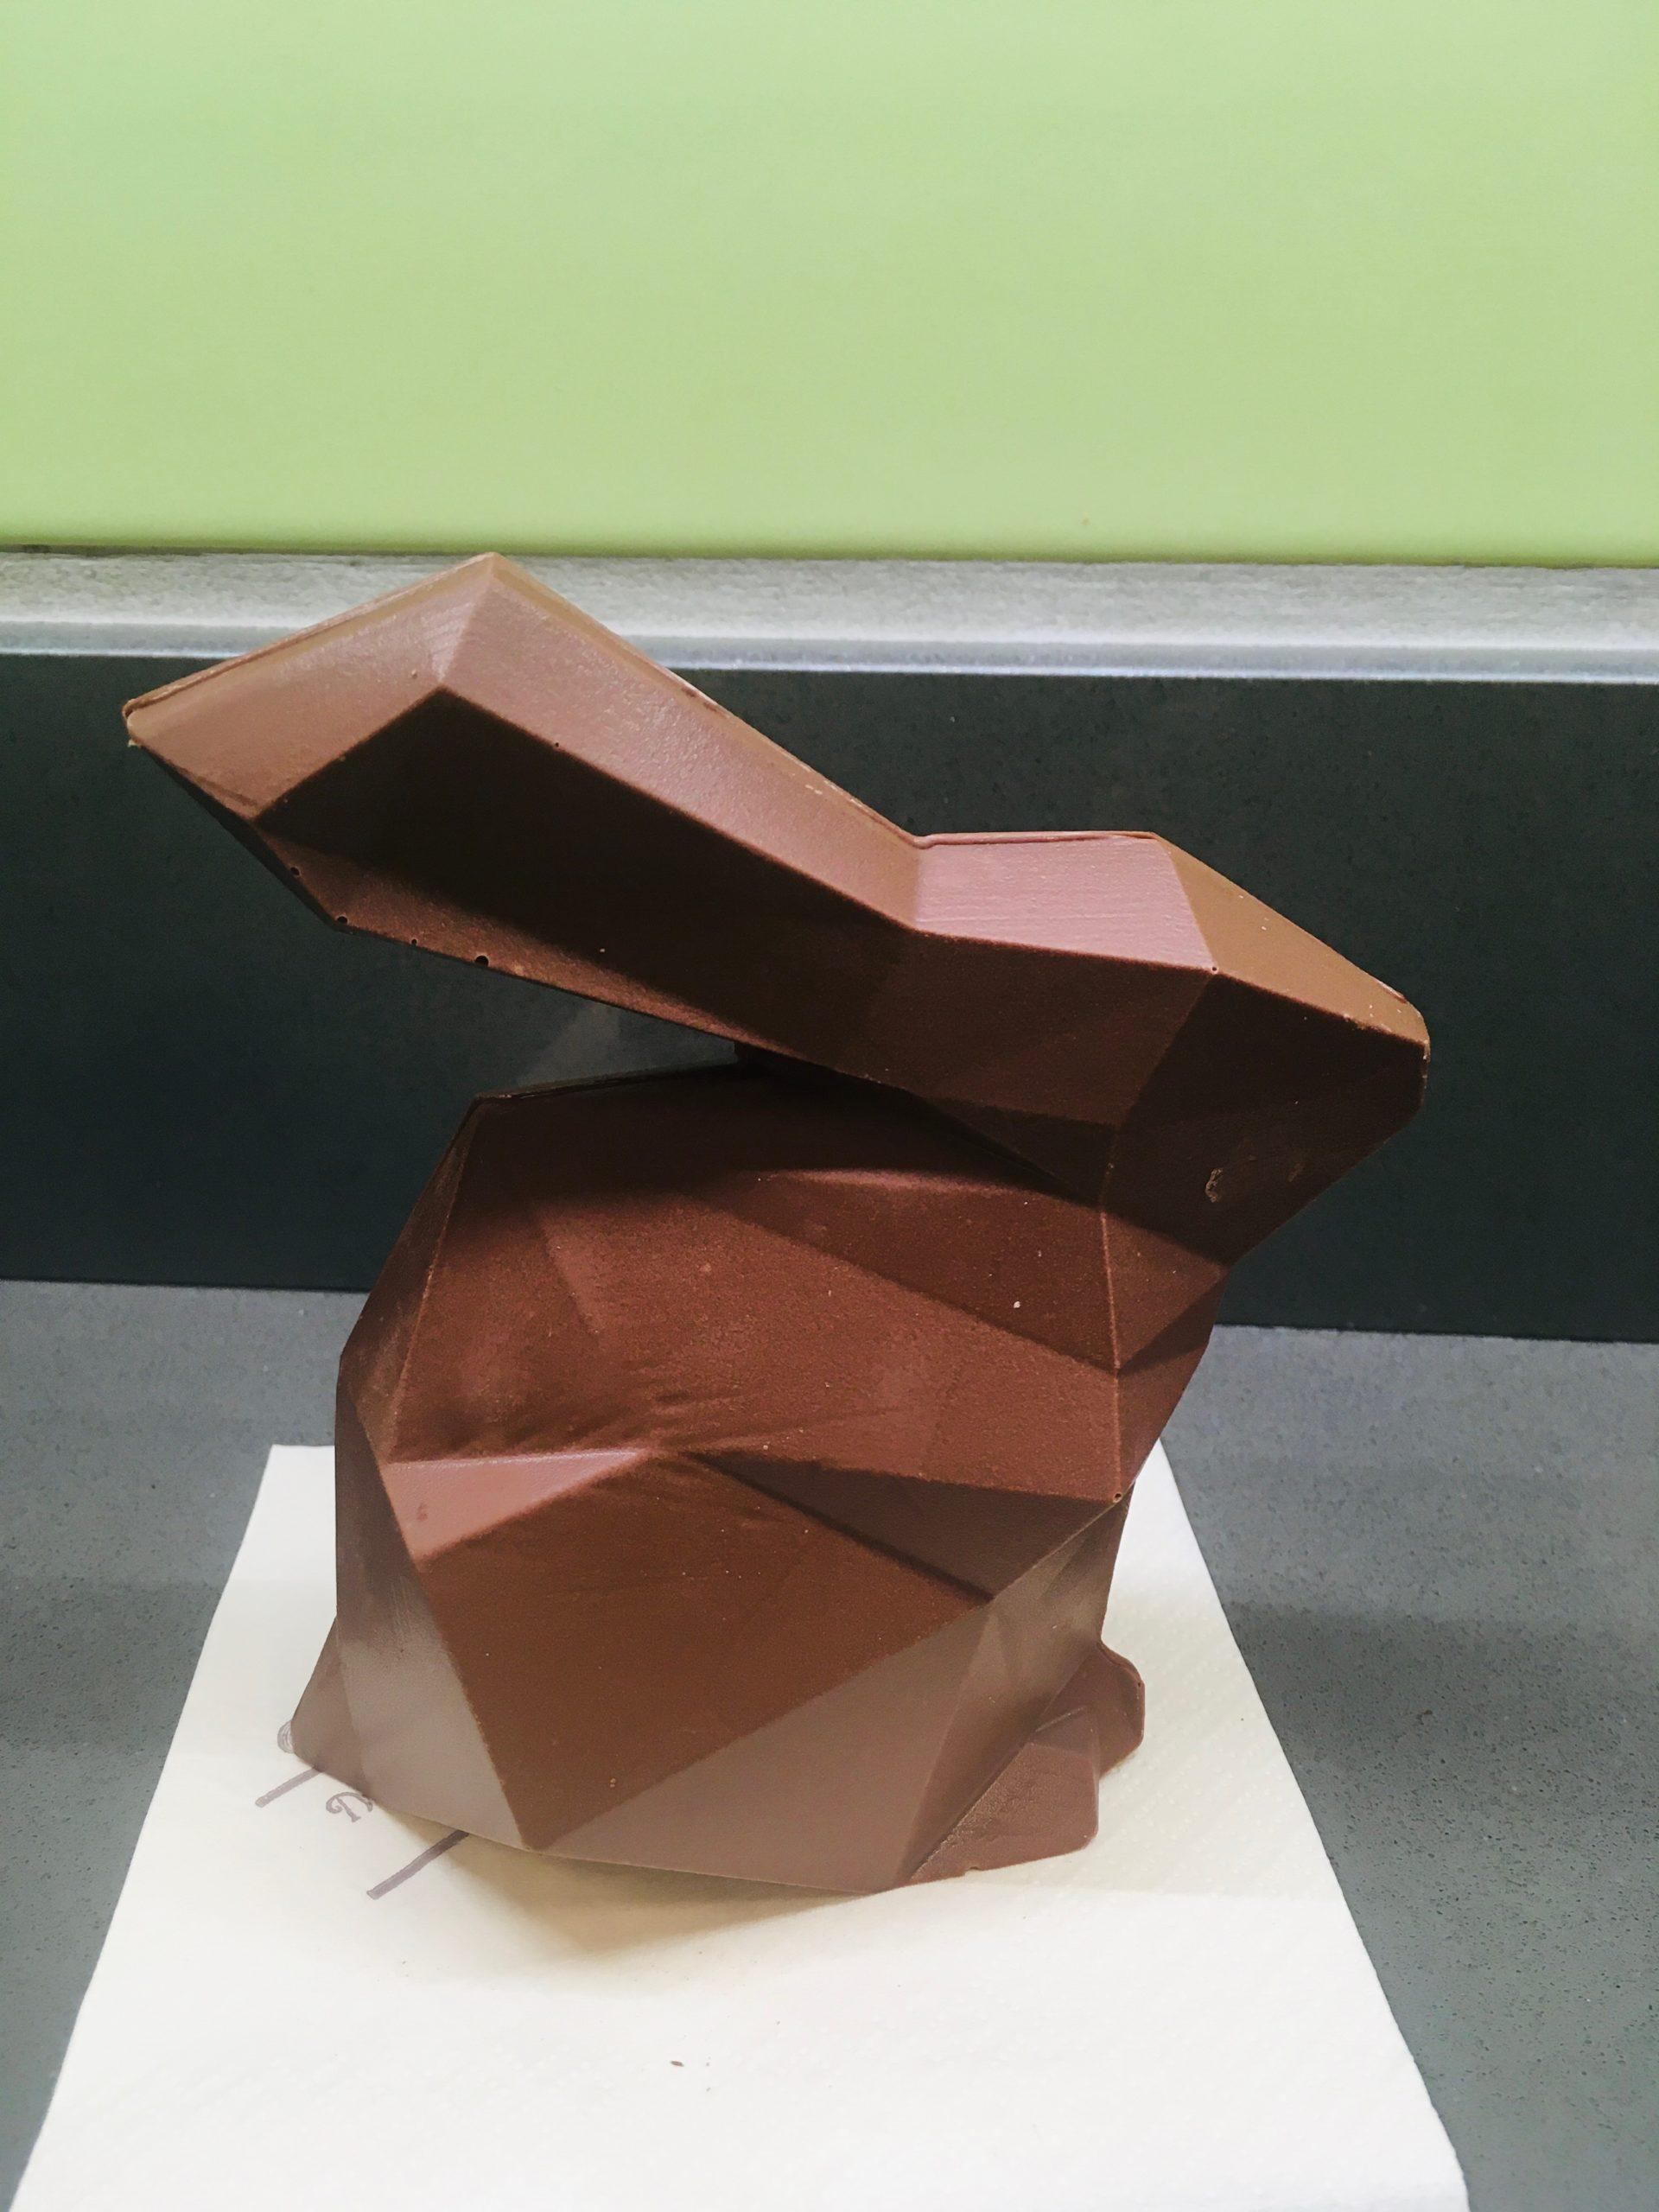 Sujet lapin origami lait